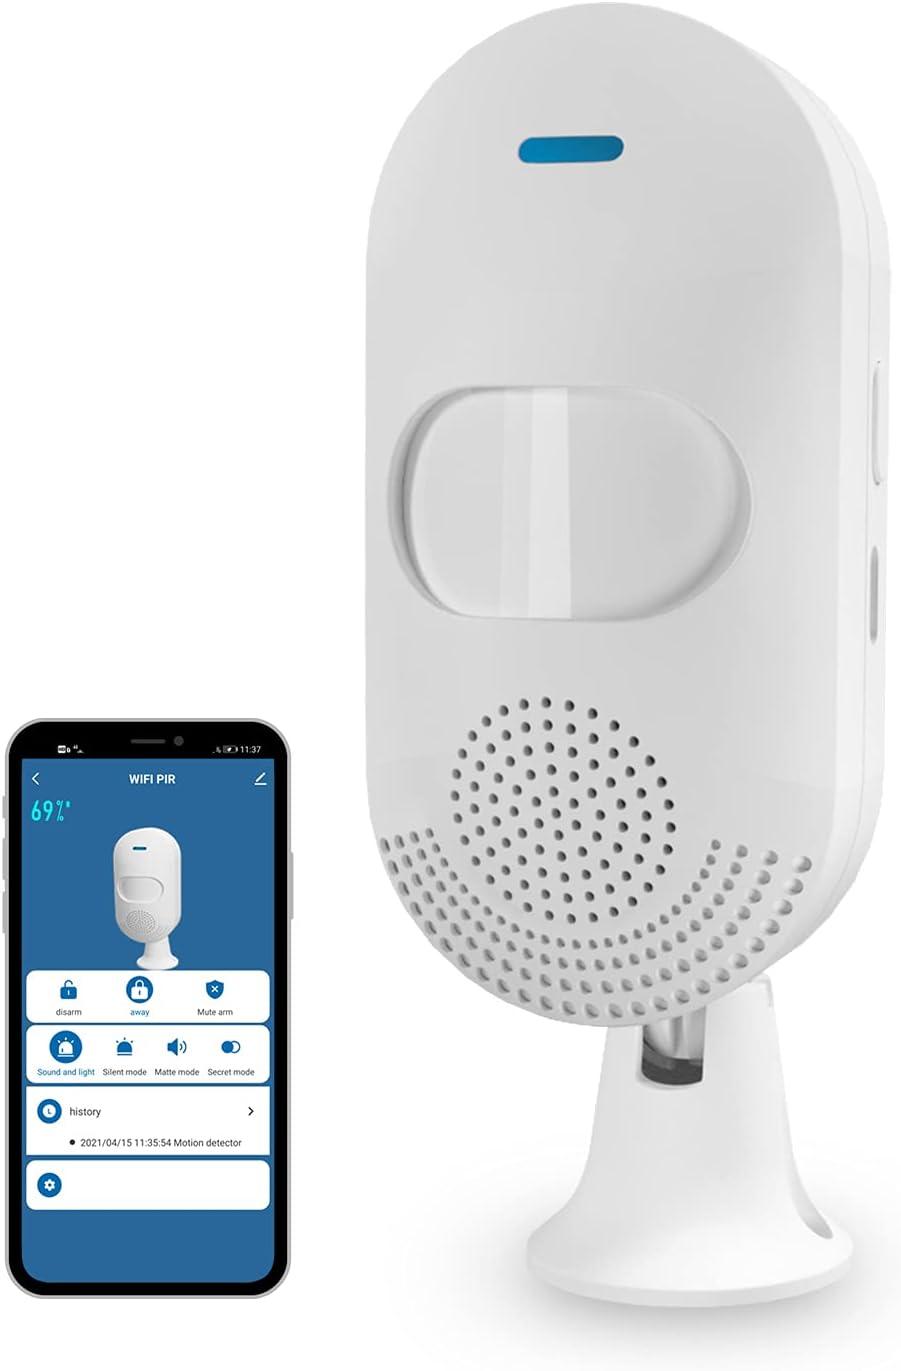 WiFi Smart Motion Sensor Alarm Feelink Indoor Infrared PIR Detector Siren Tuya Smart APP Control Wireless Trigger Player Home Security, Compatible with Alexa, Siri